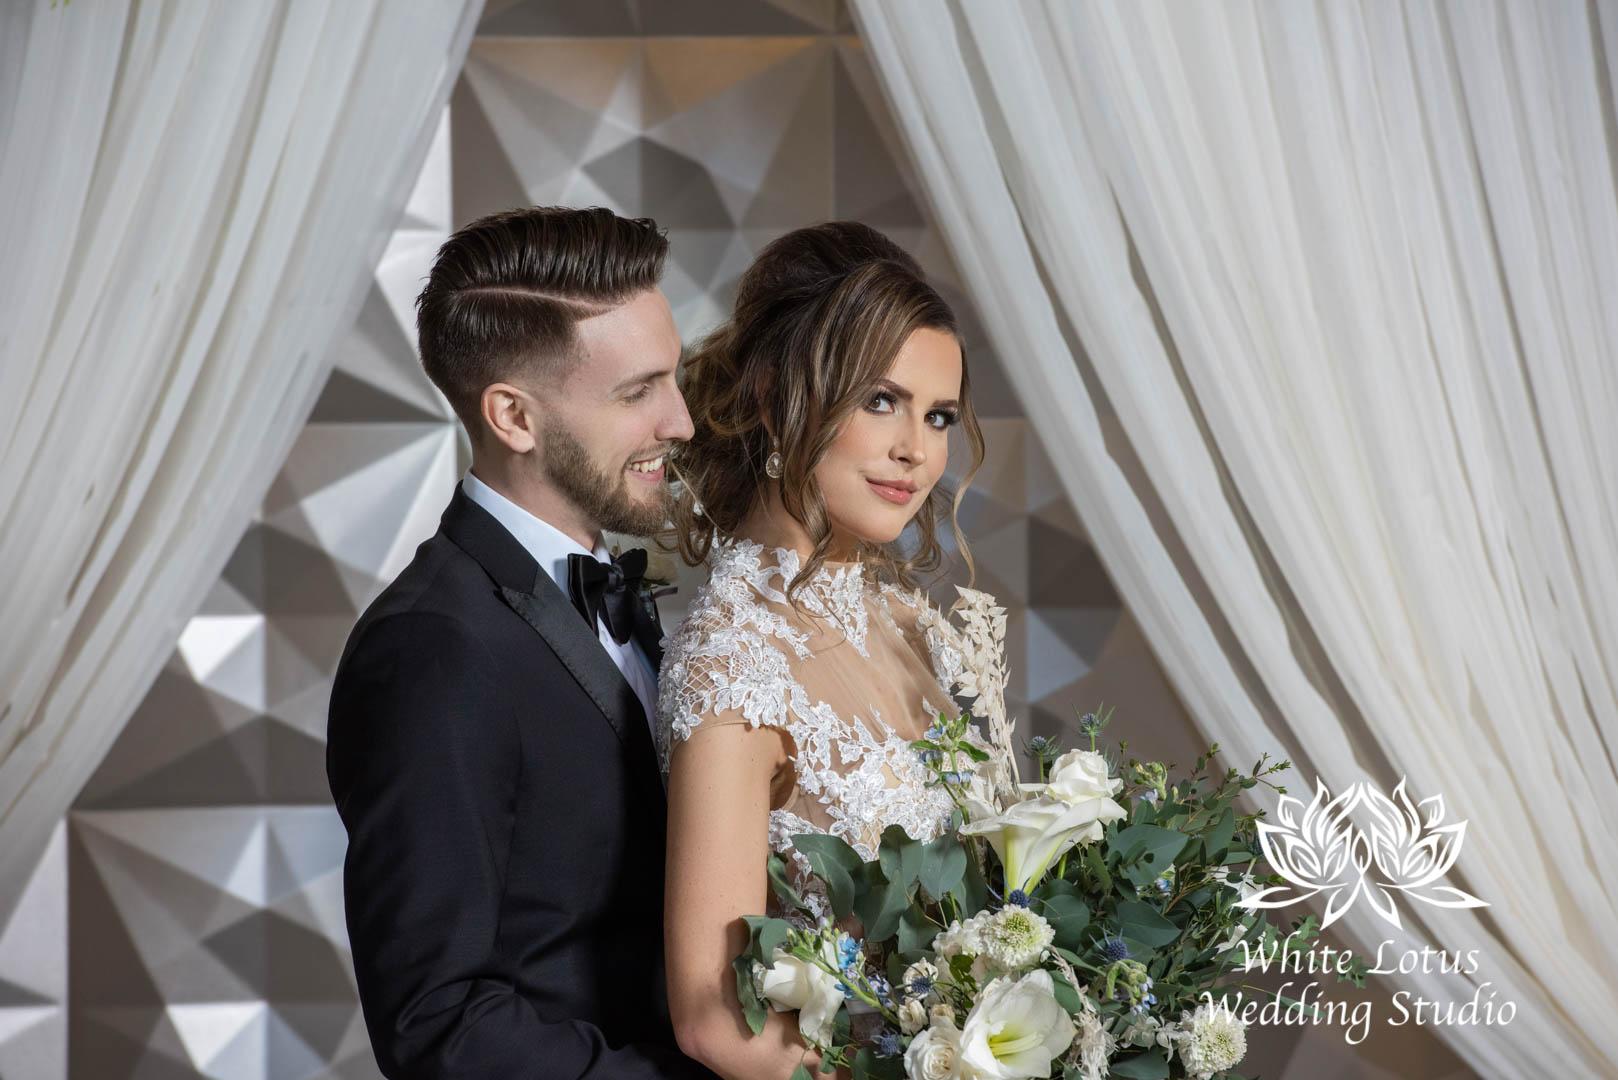 040- GLAM WINTERLUXE WEDDING INSPIRATION